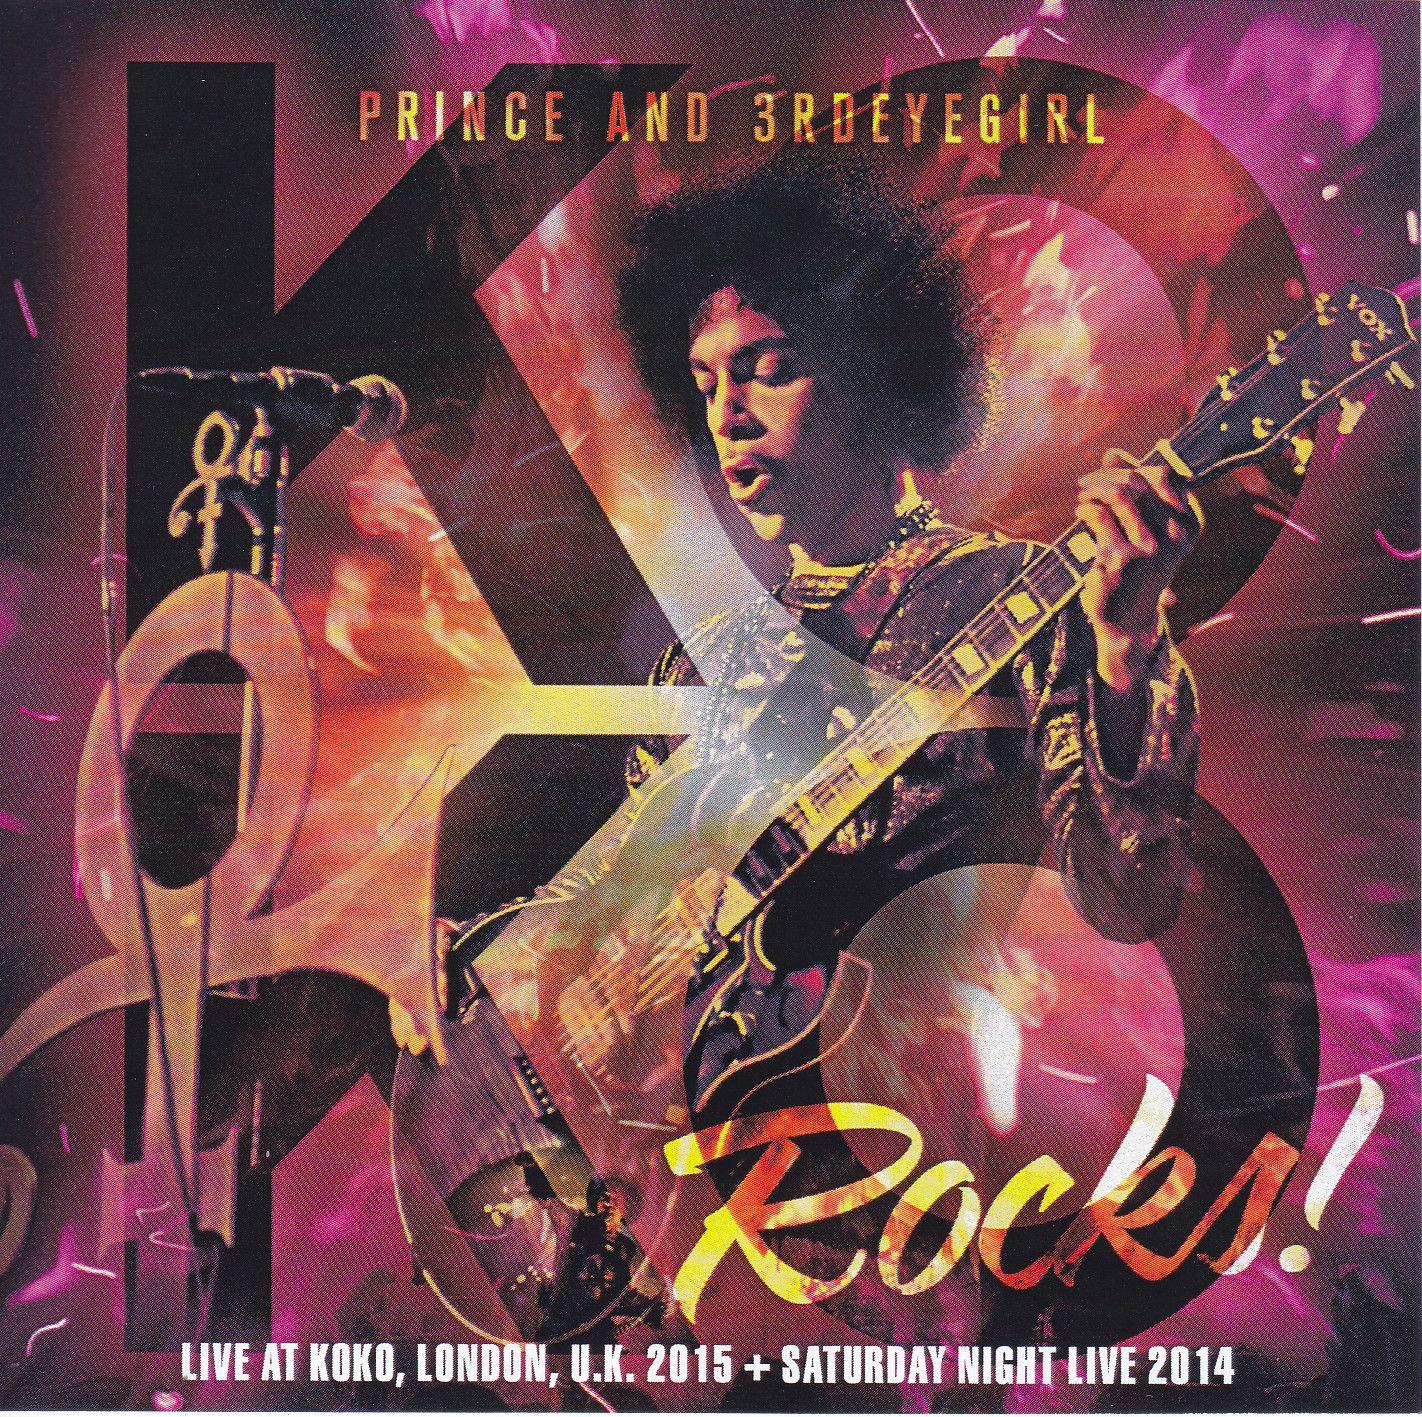 prince-3rd-eyegirl-koko-rock1.jpg (1422×1417)